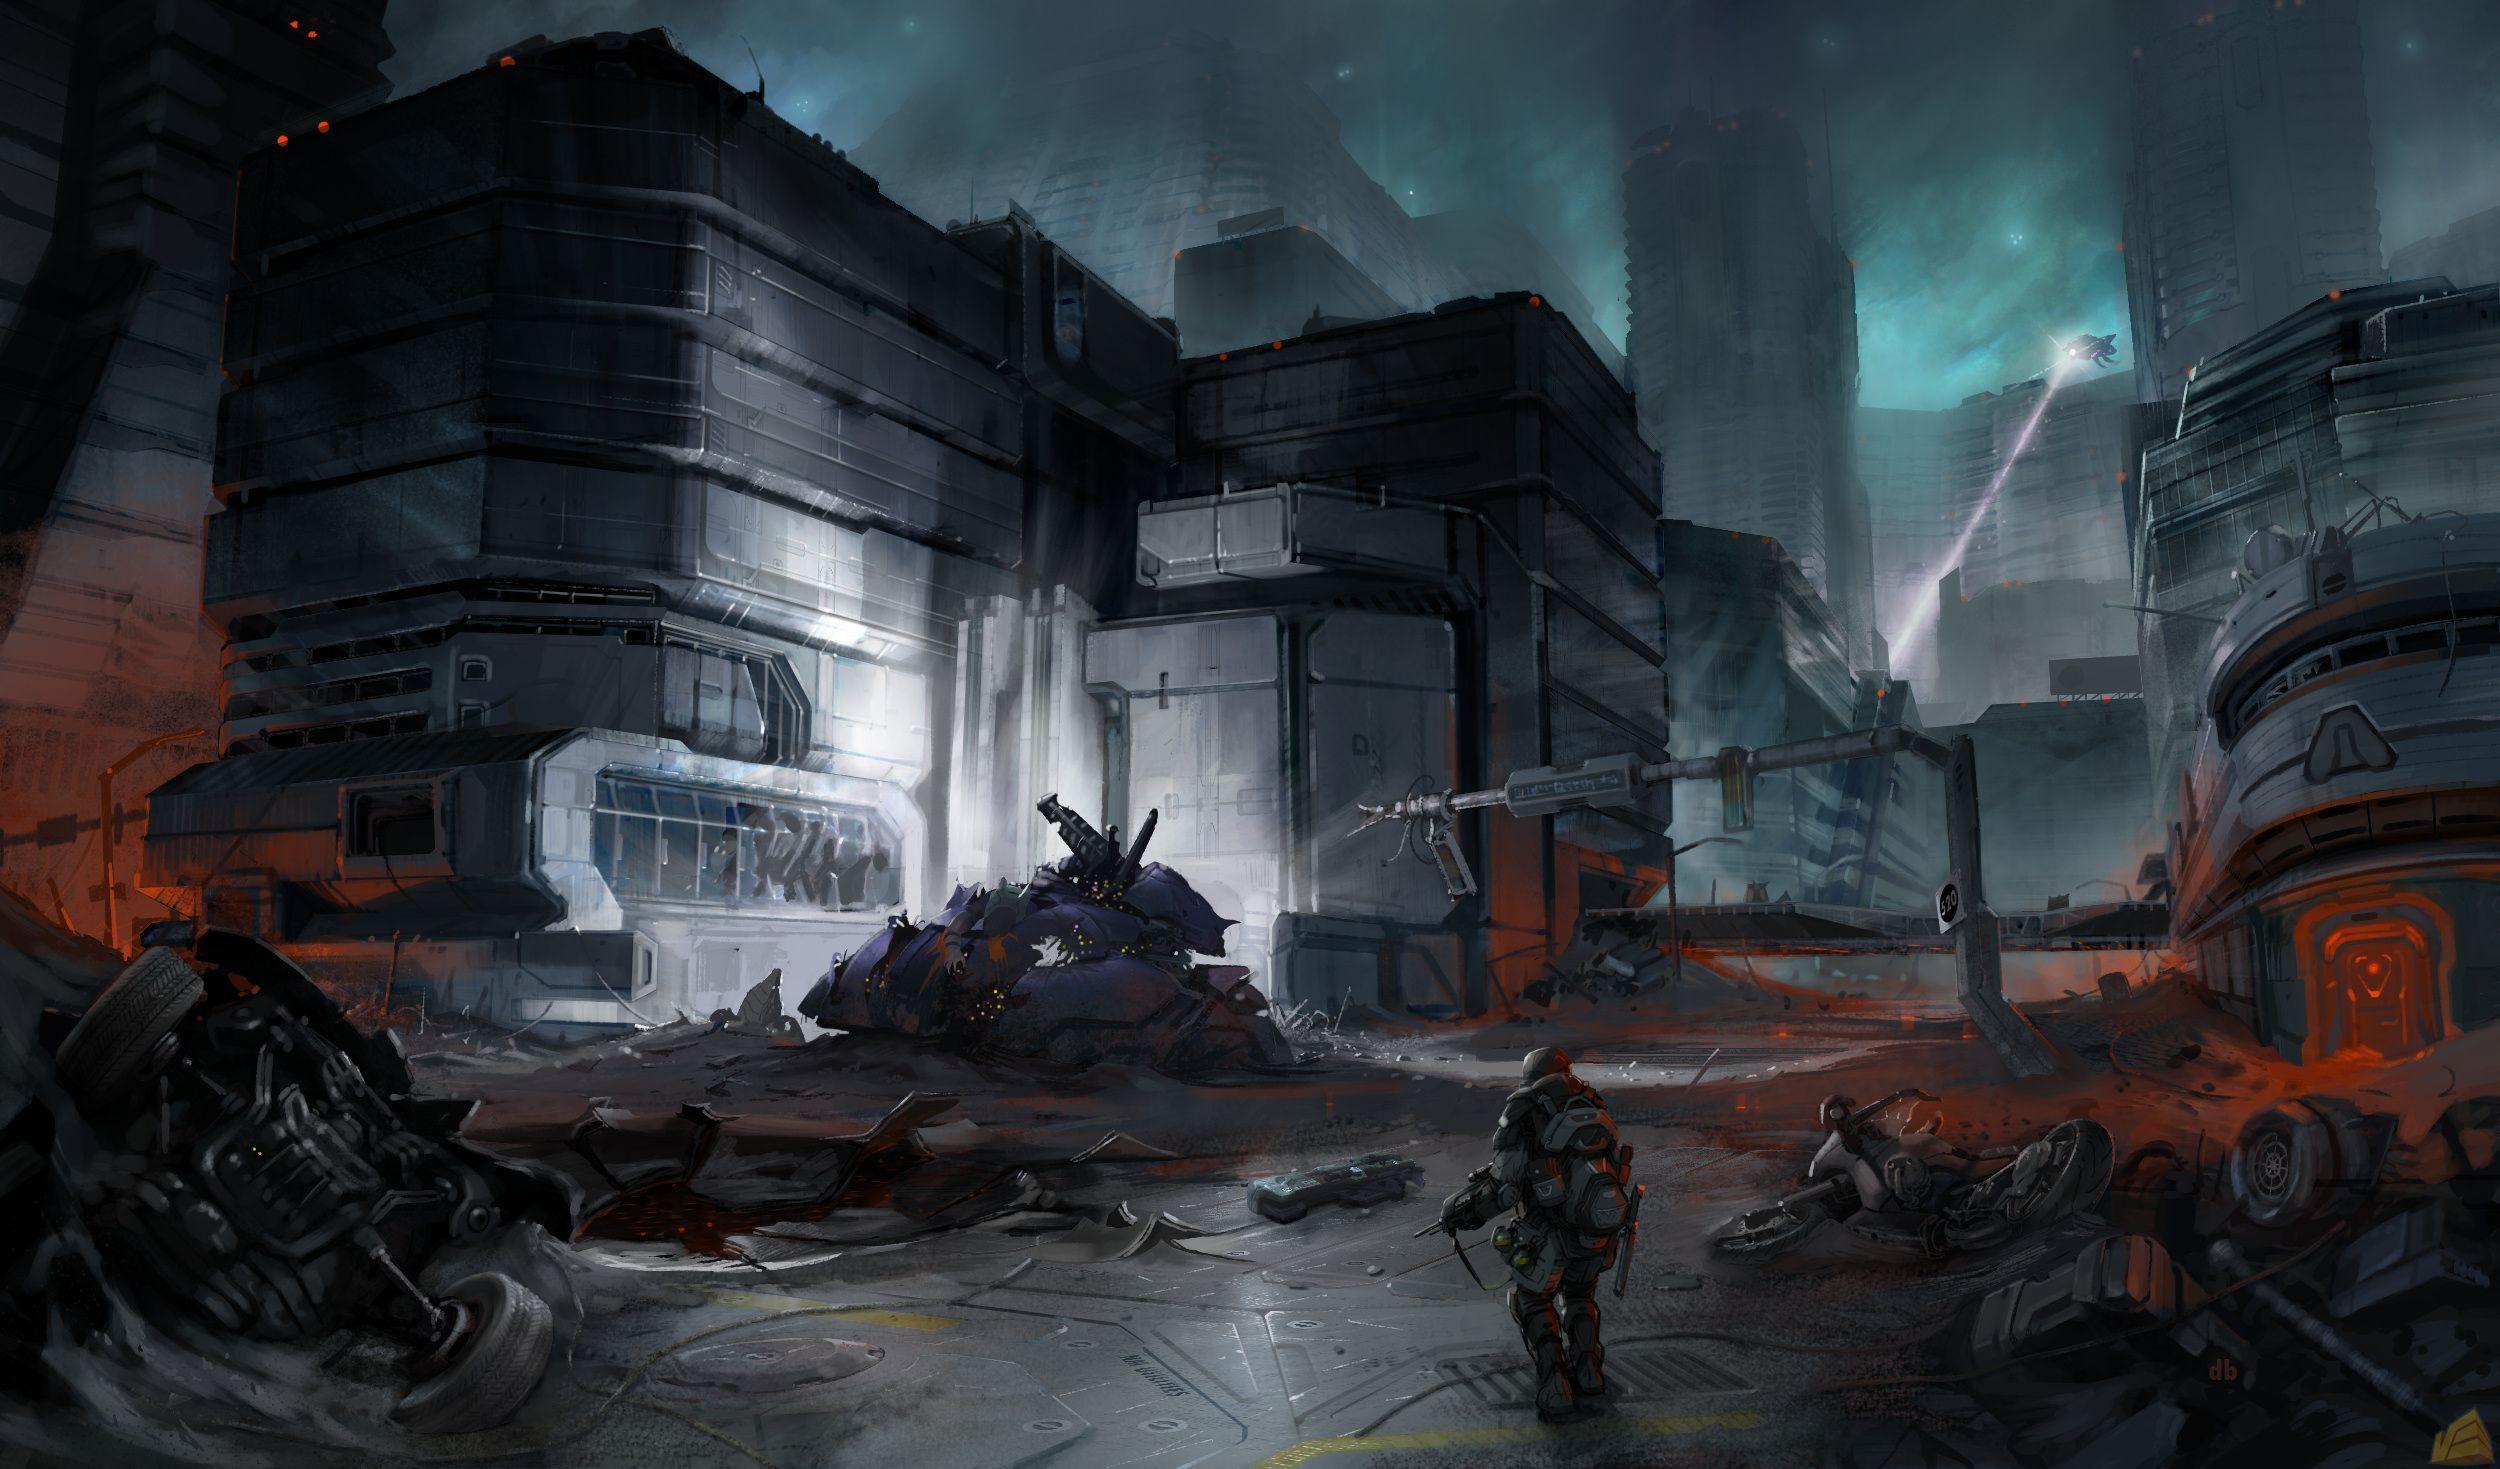 Halo Odst Art Halo 3 Odst Halo 3 Halo